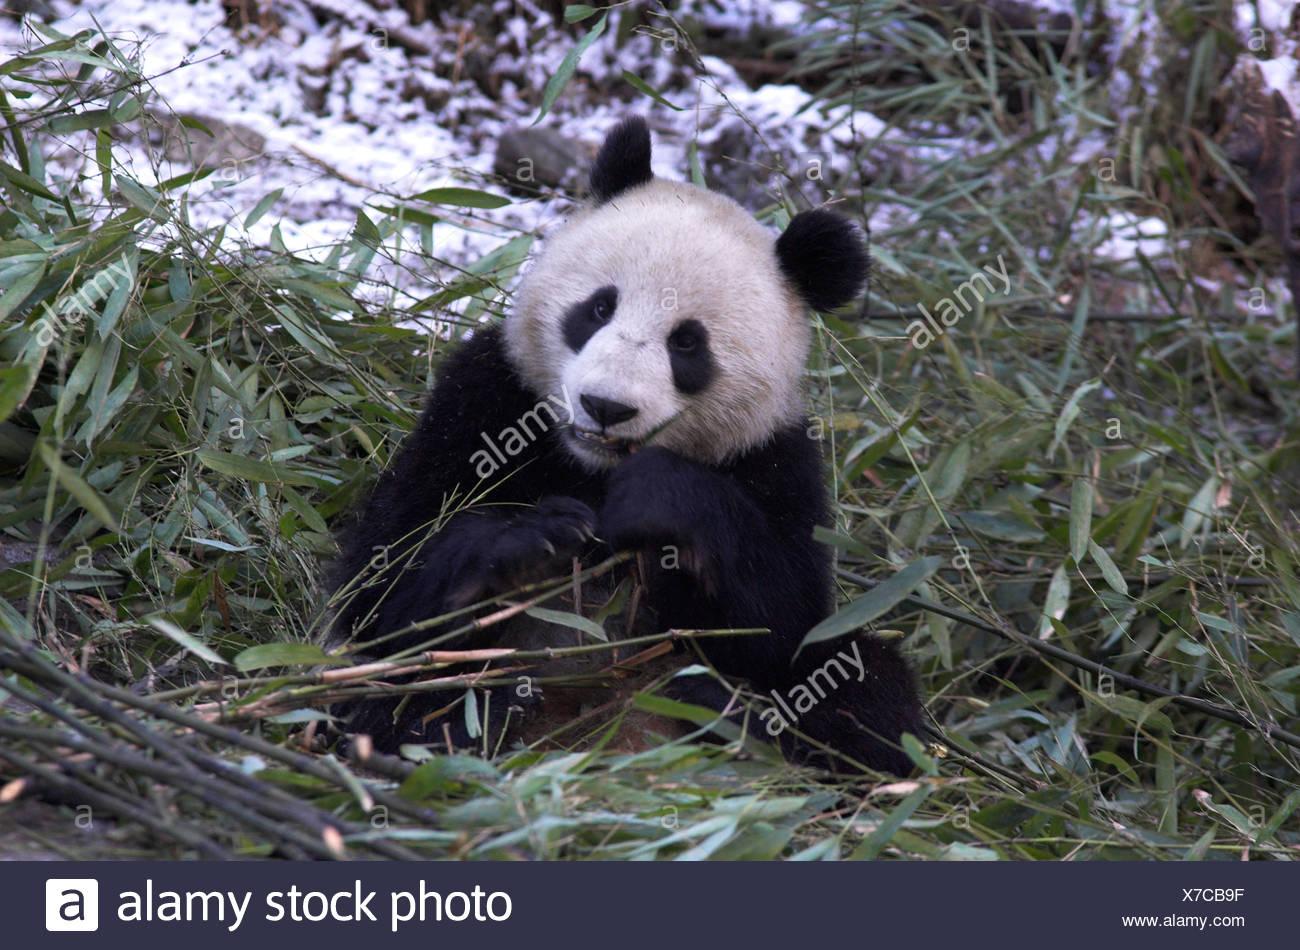 Giant Panda Ailuropoda Melanoleuca Futterung Auf Bambus Wolong